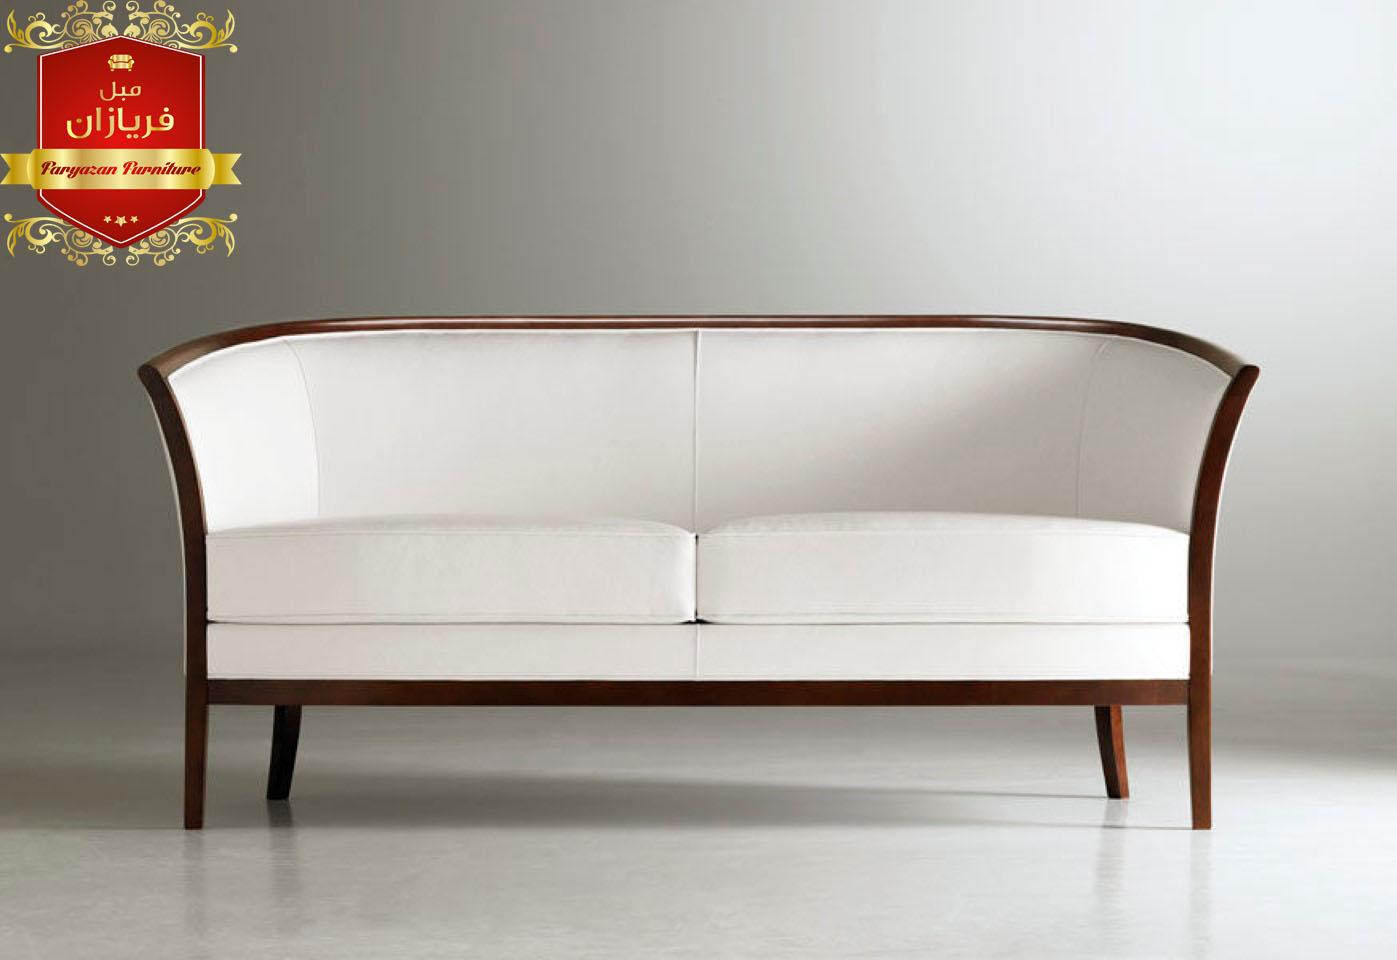 moble faryazan (1)